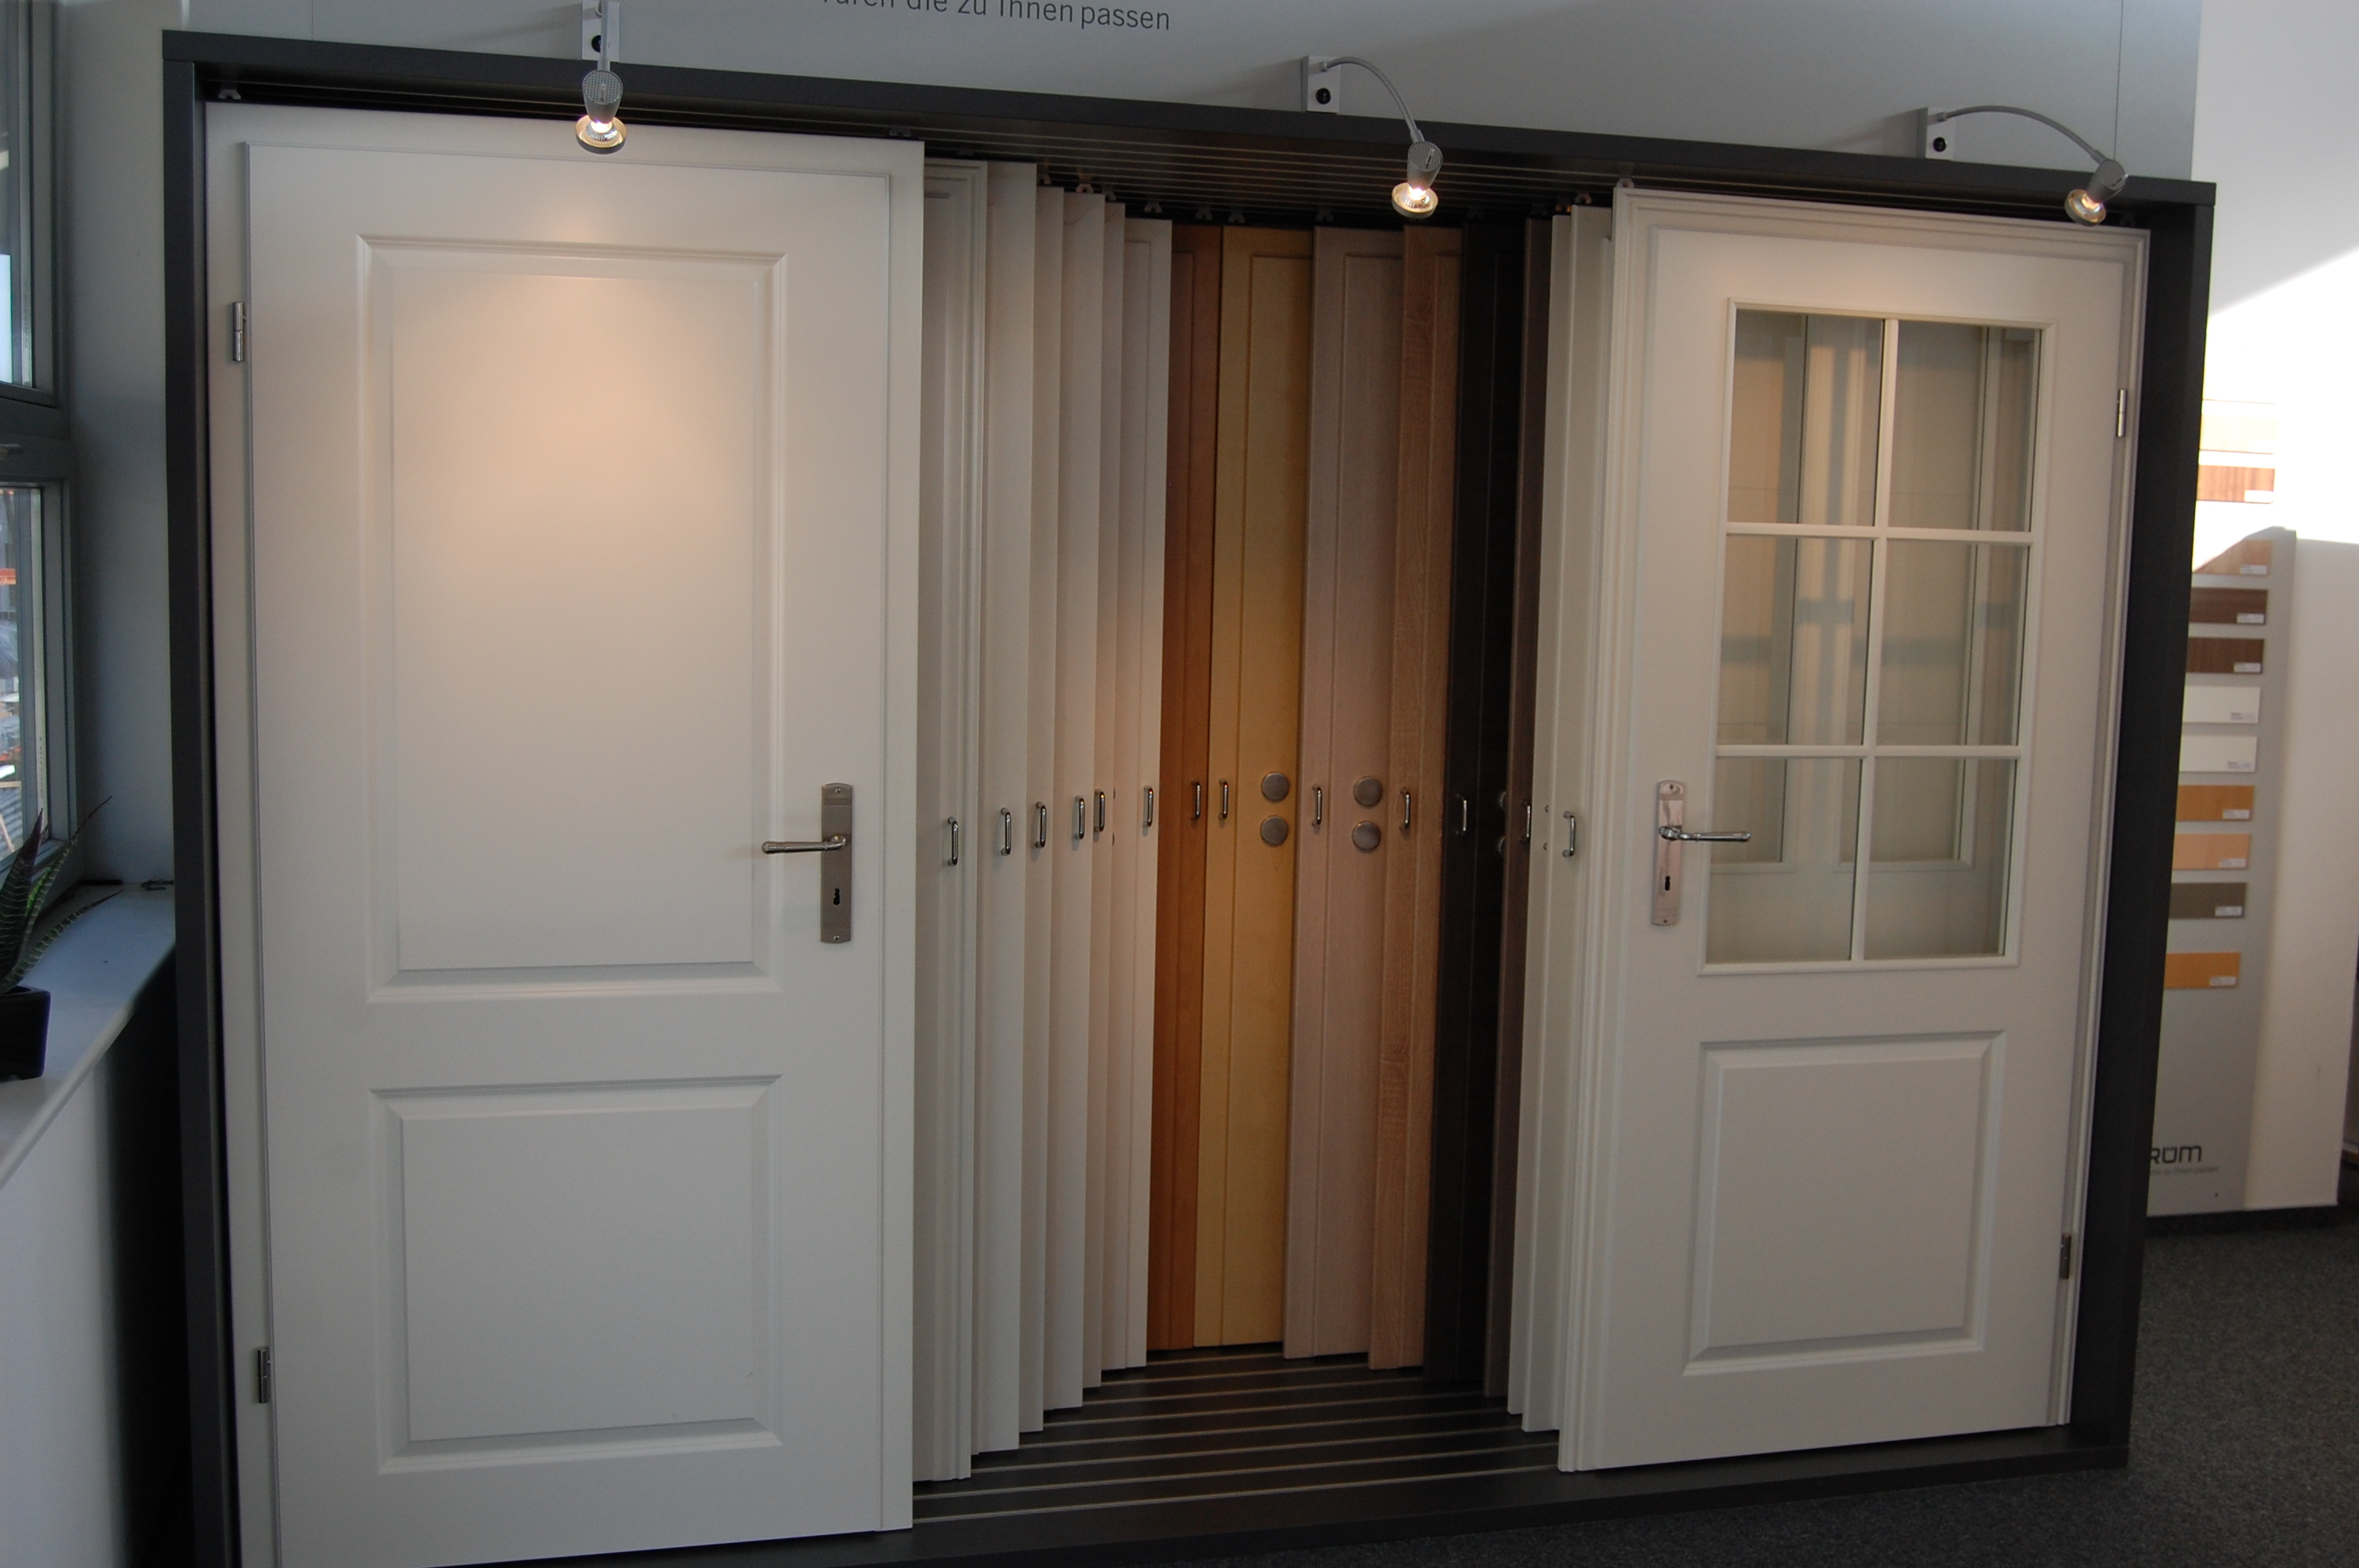 bauelemente bauxpert vierck. Black Bedroom Furniture Sets. Home Design Ideas